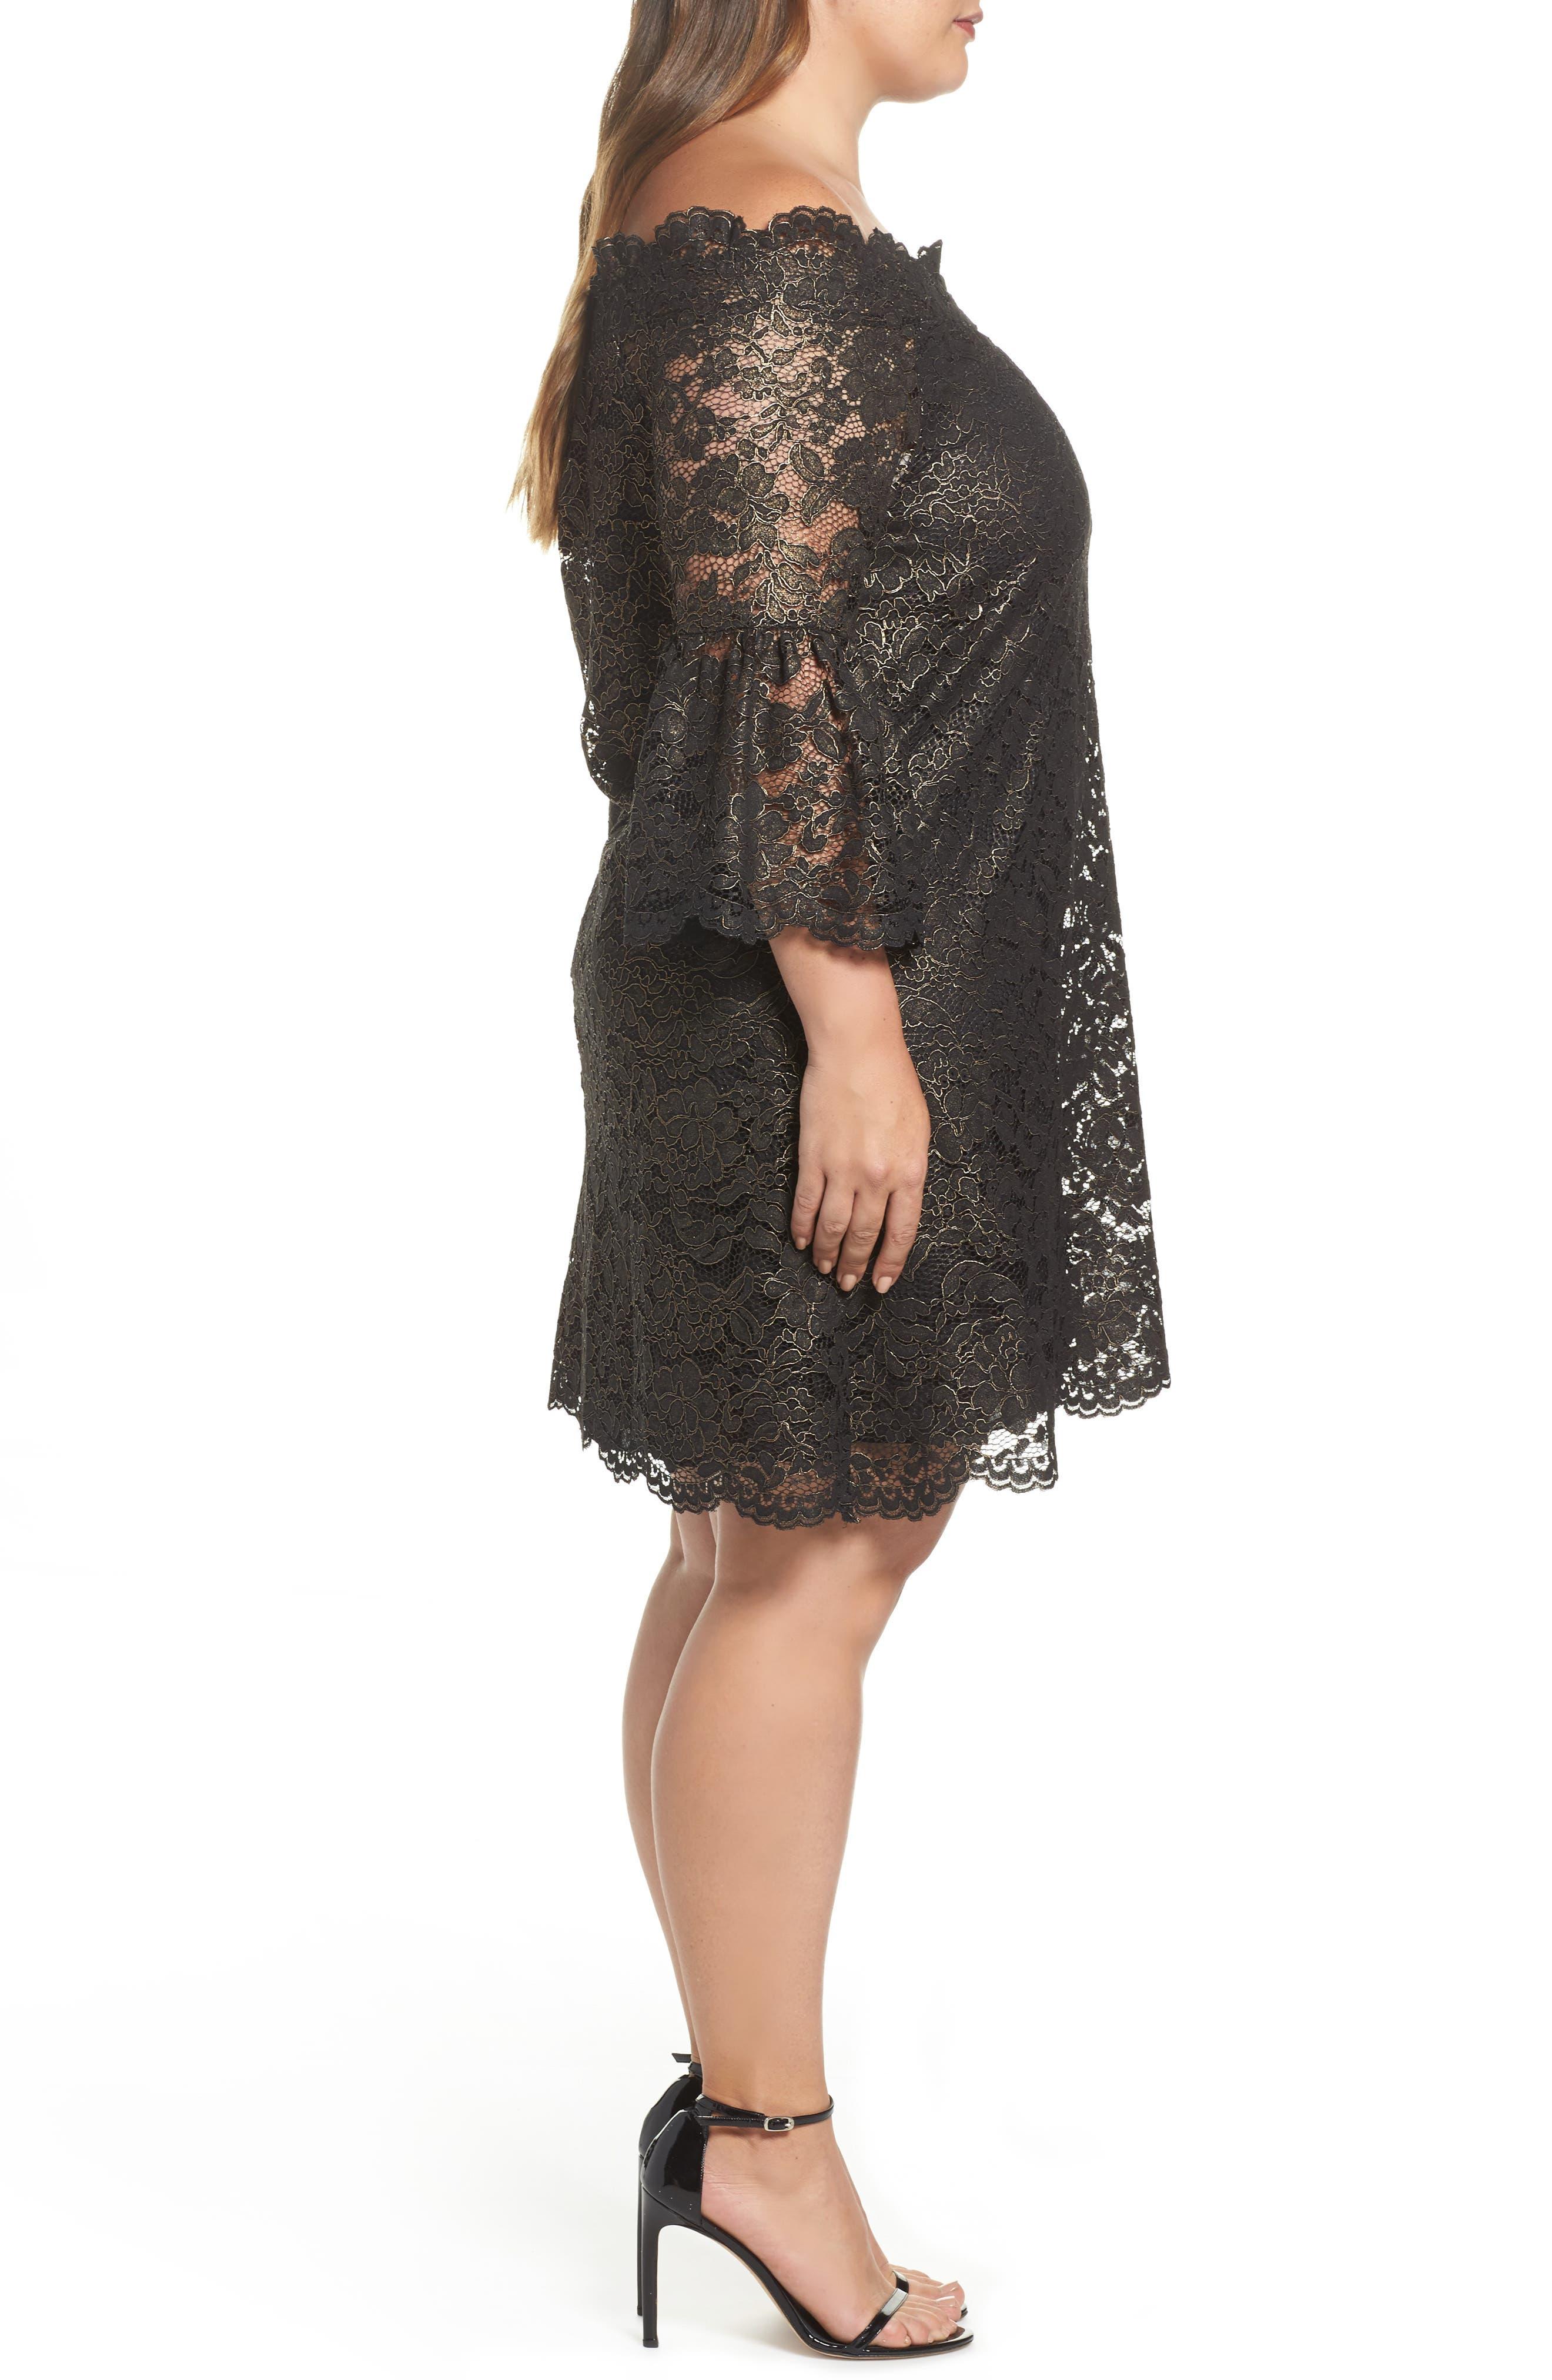 Off the Shoulder Black Gold Lace Dress,                             Alternate thumbnail 3, color,                             005